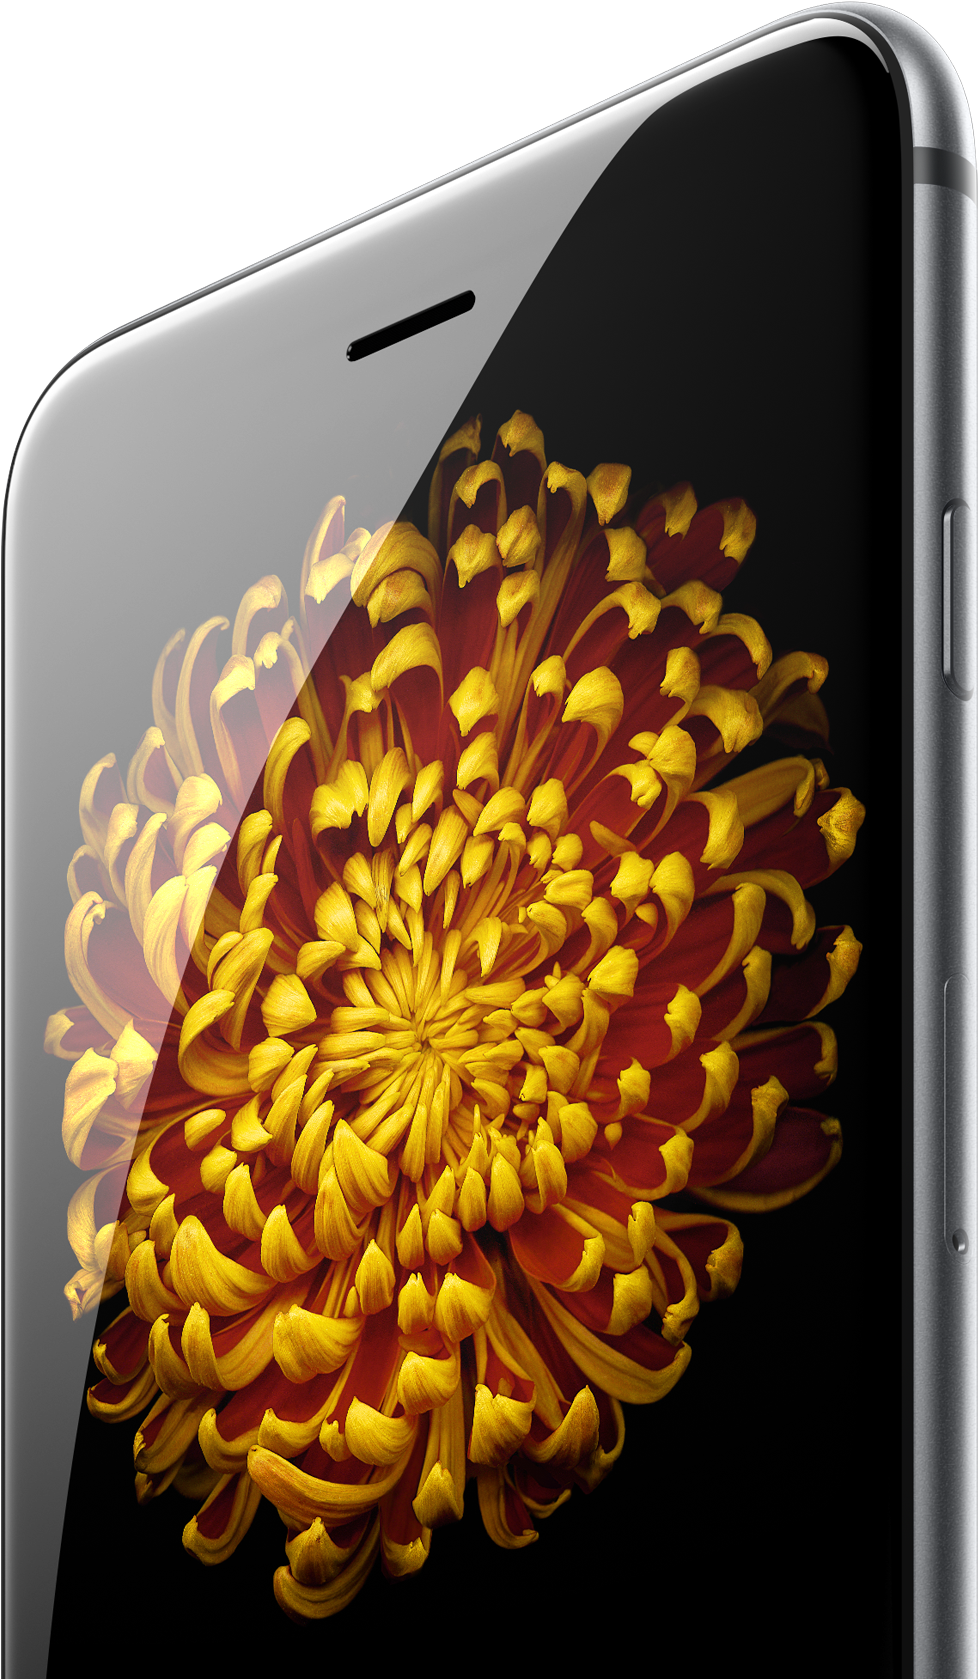 ↪ Finja surpresa  pré-venda dos iPhones 6 e 6 Plus bate novo ... 620d83421e